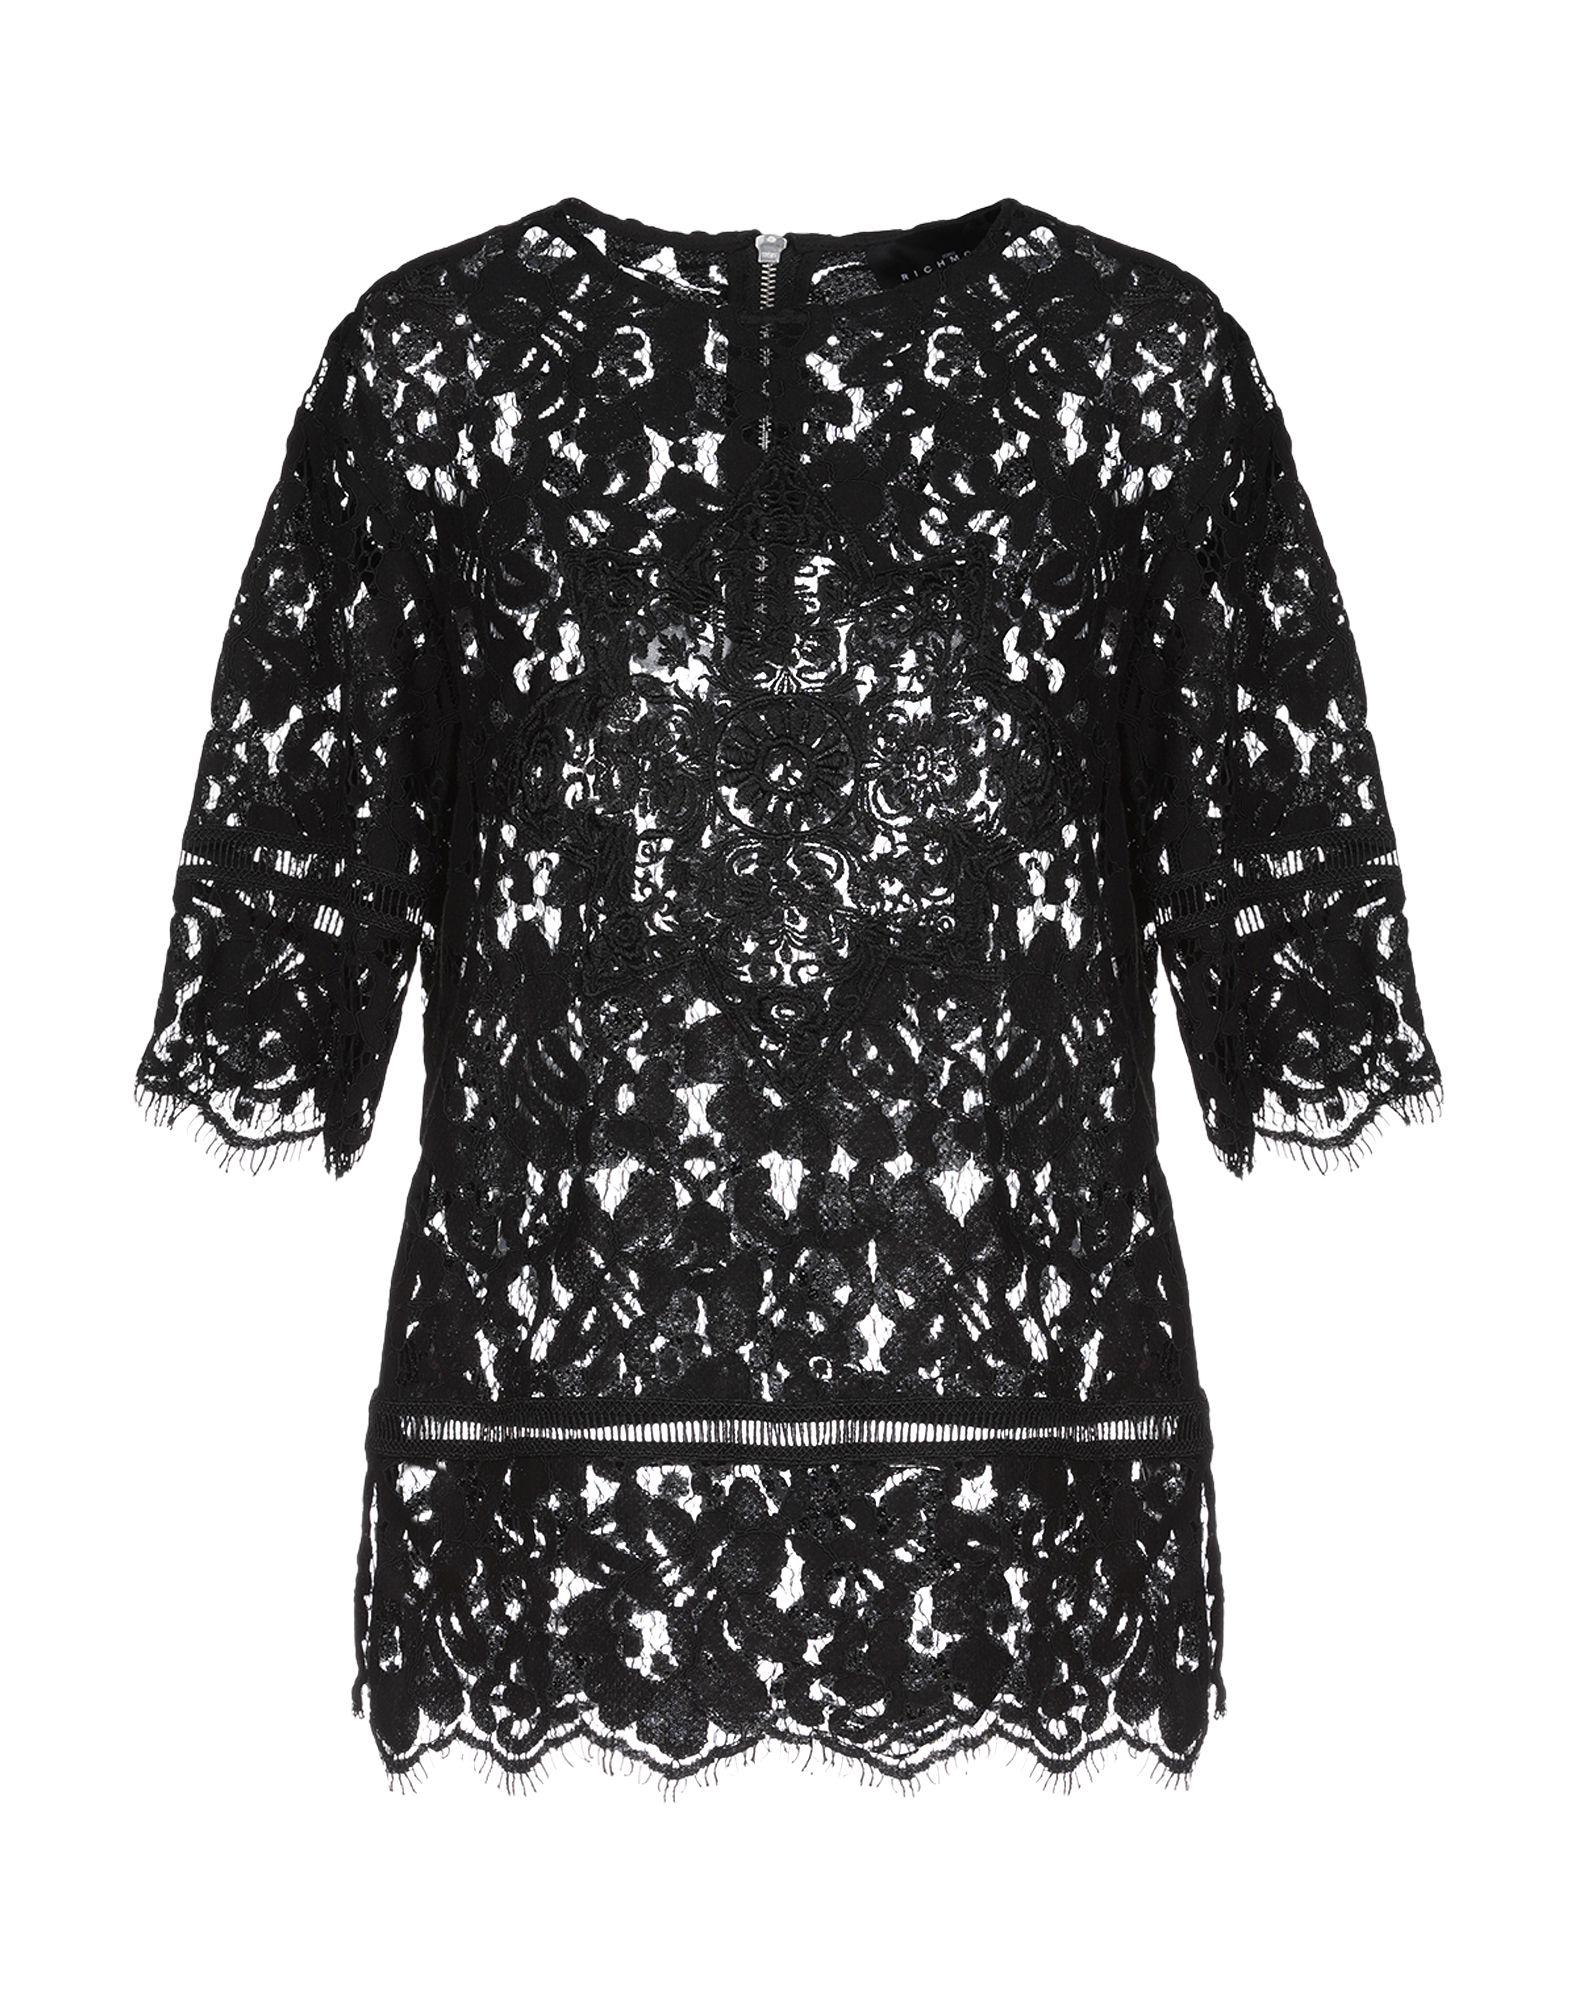 JOHN RICHMOND Блузка полуприлегающая блузка с воротником качели john richmond